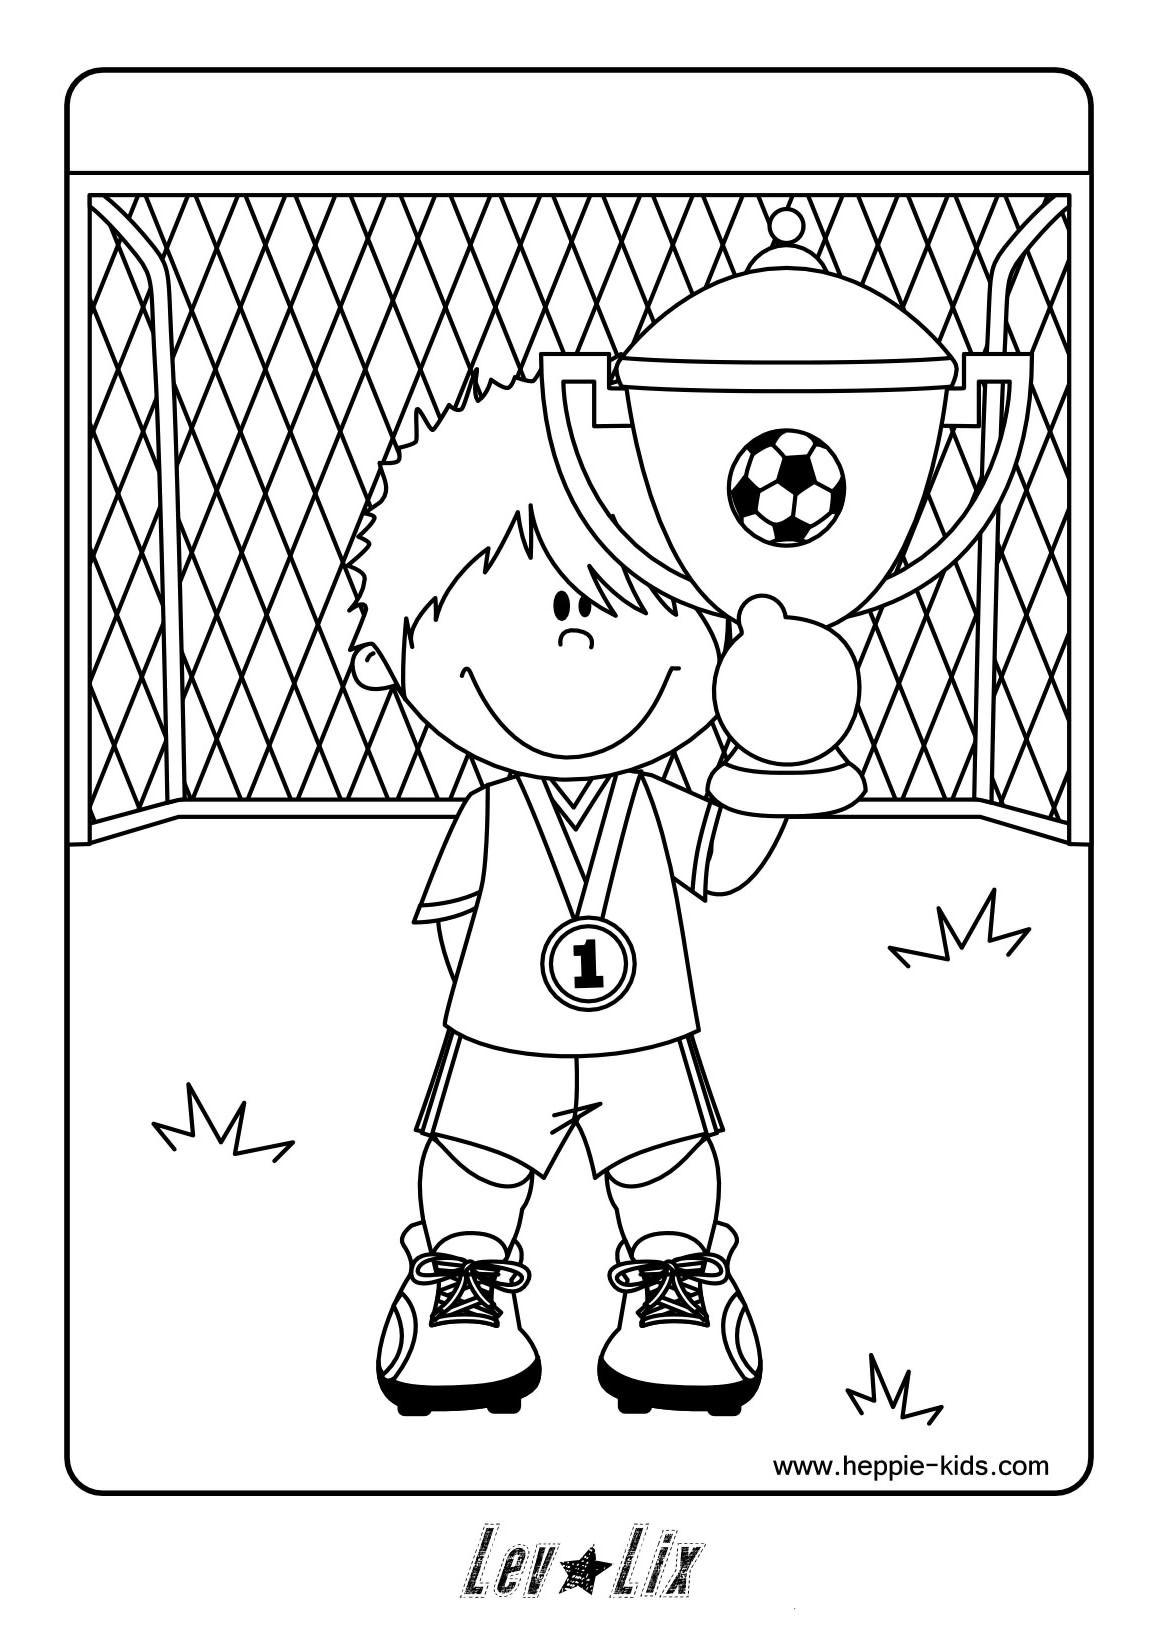 Kleurplaat Voetbal Rode Duivels Pinterest Sports Coloring